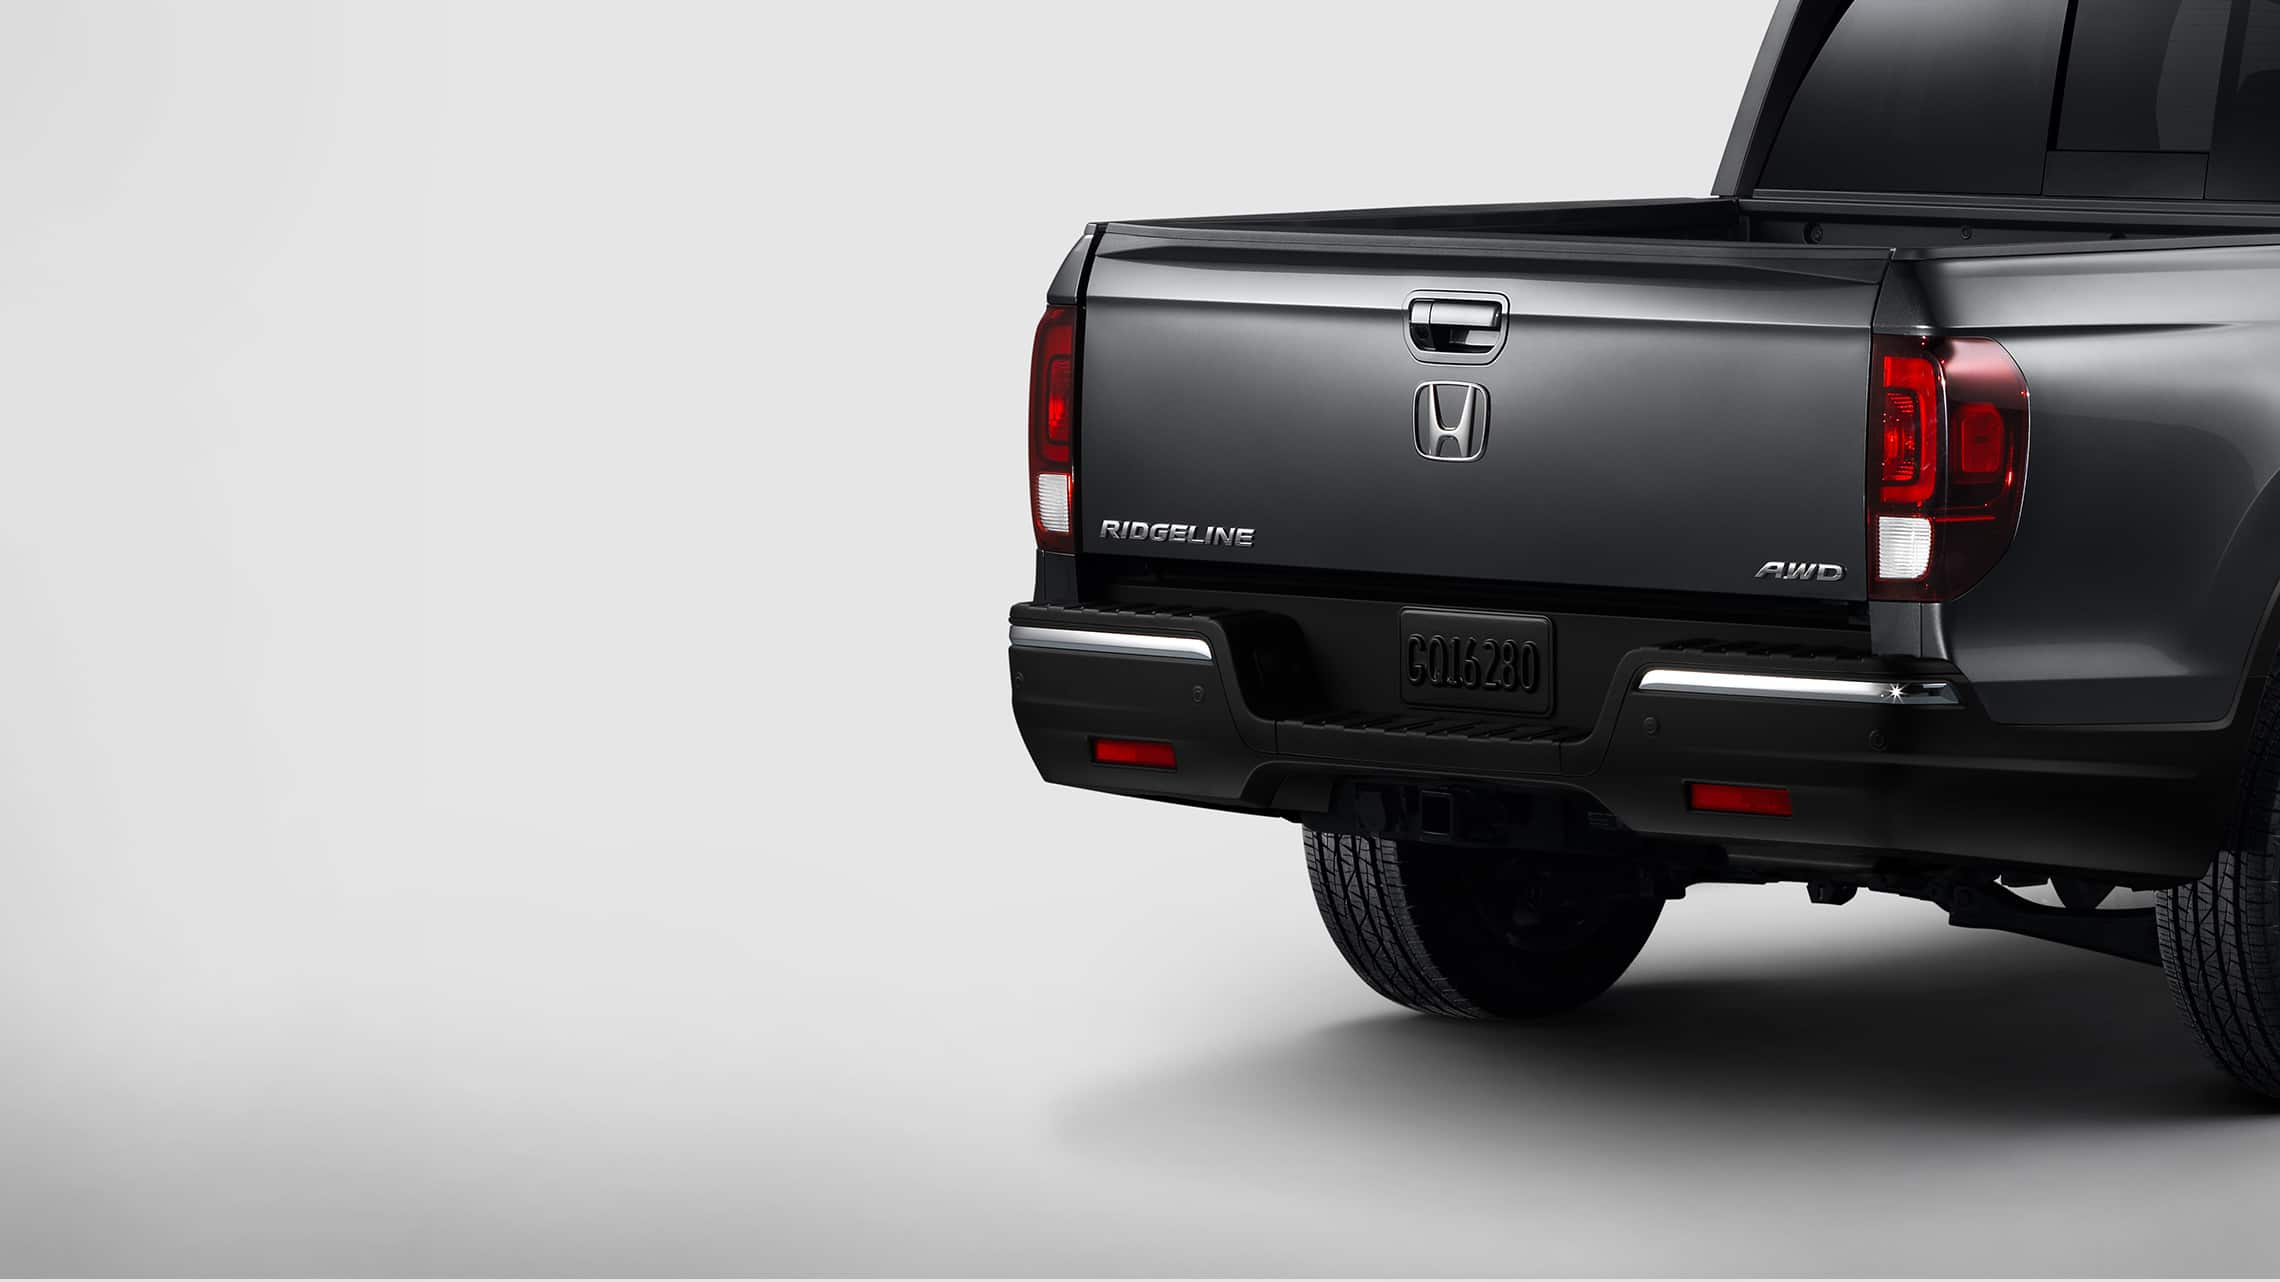 Detalle de la puerta trasera de acción doble en la Honda Ridgeline RTL-E2020 en Modern Steel Metallic.